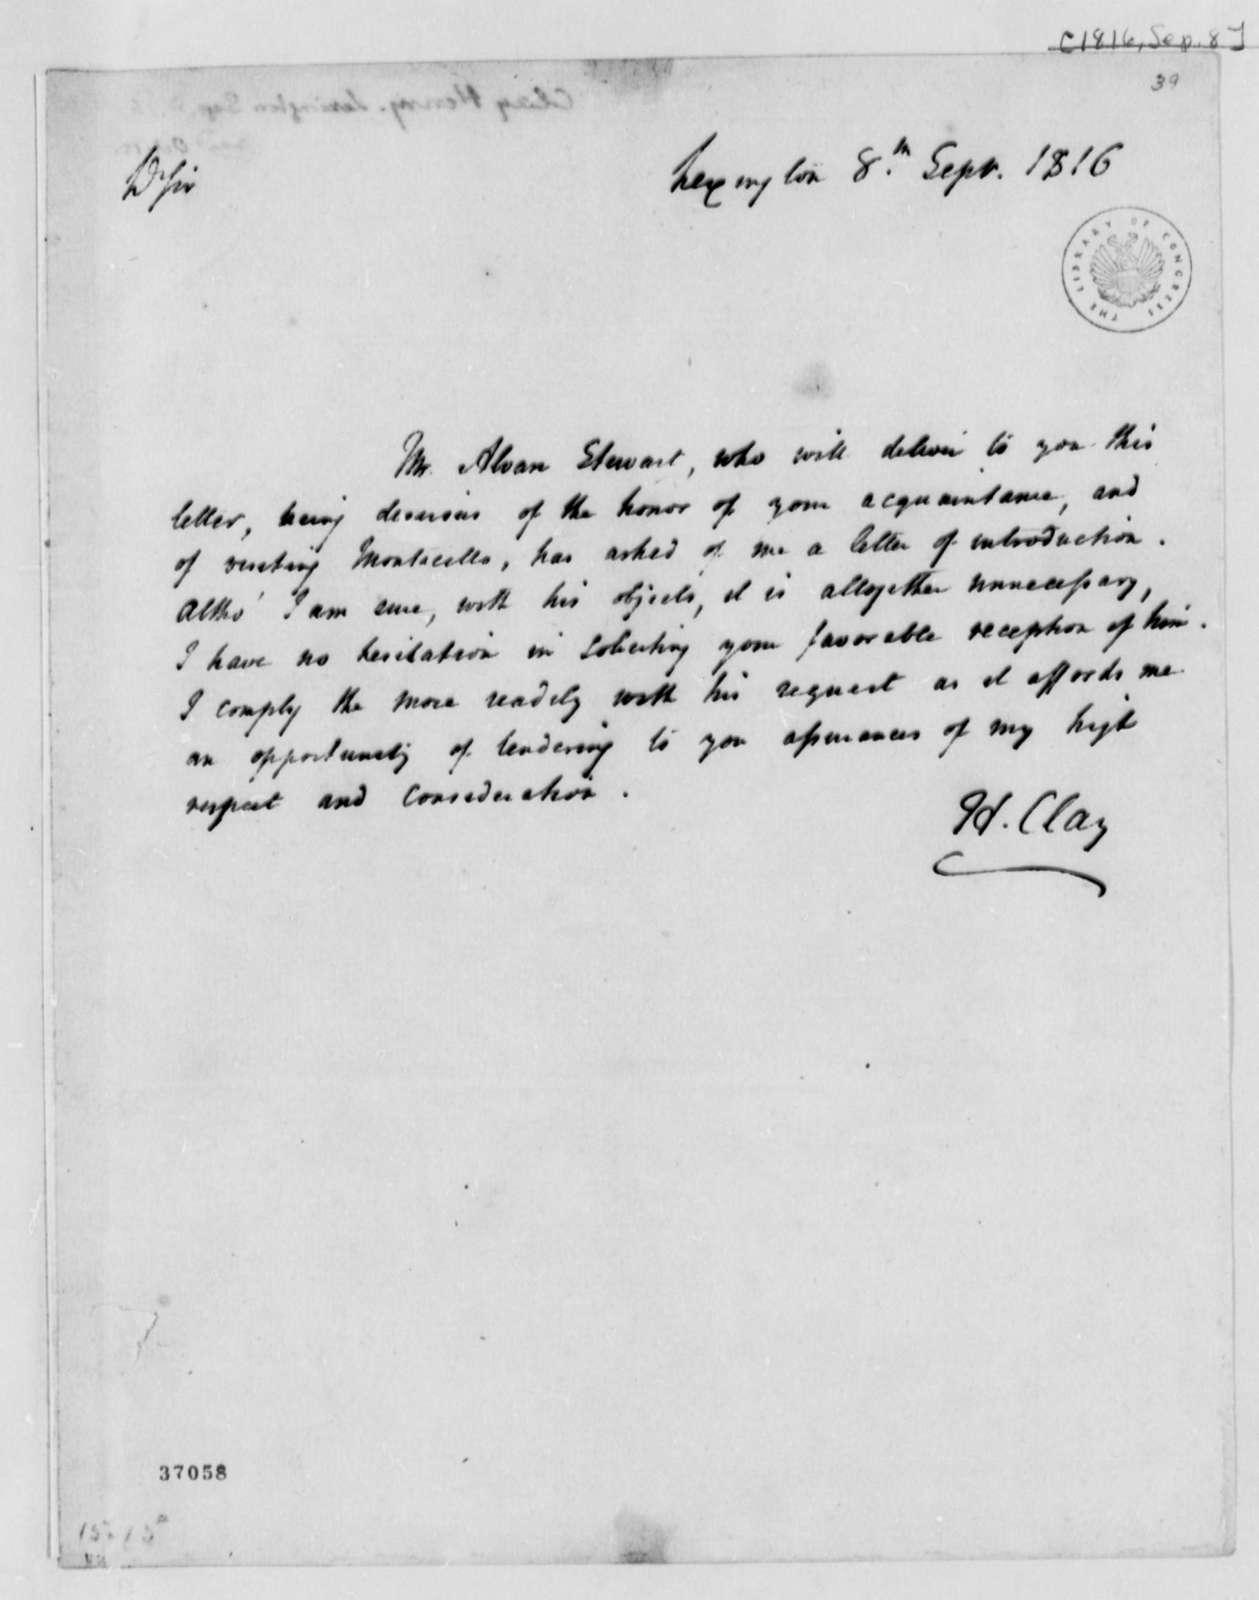 Henry Clay to Thomas Jefferson, September 8, 1816